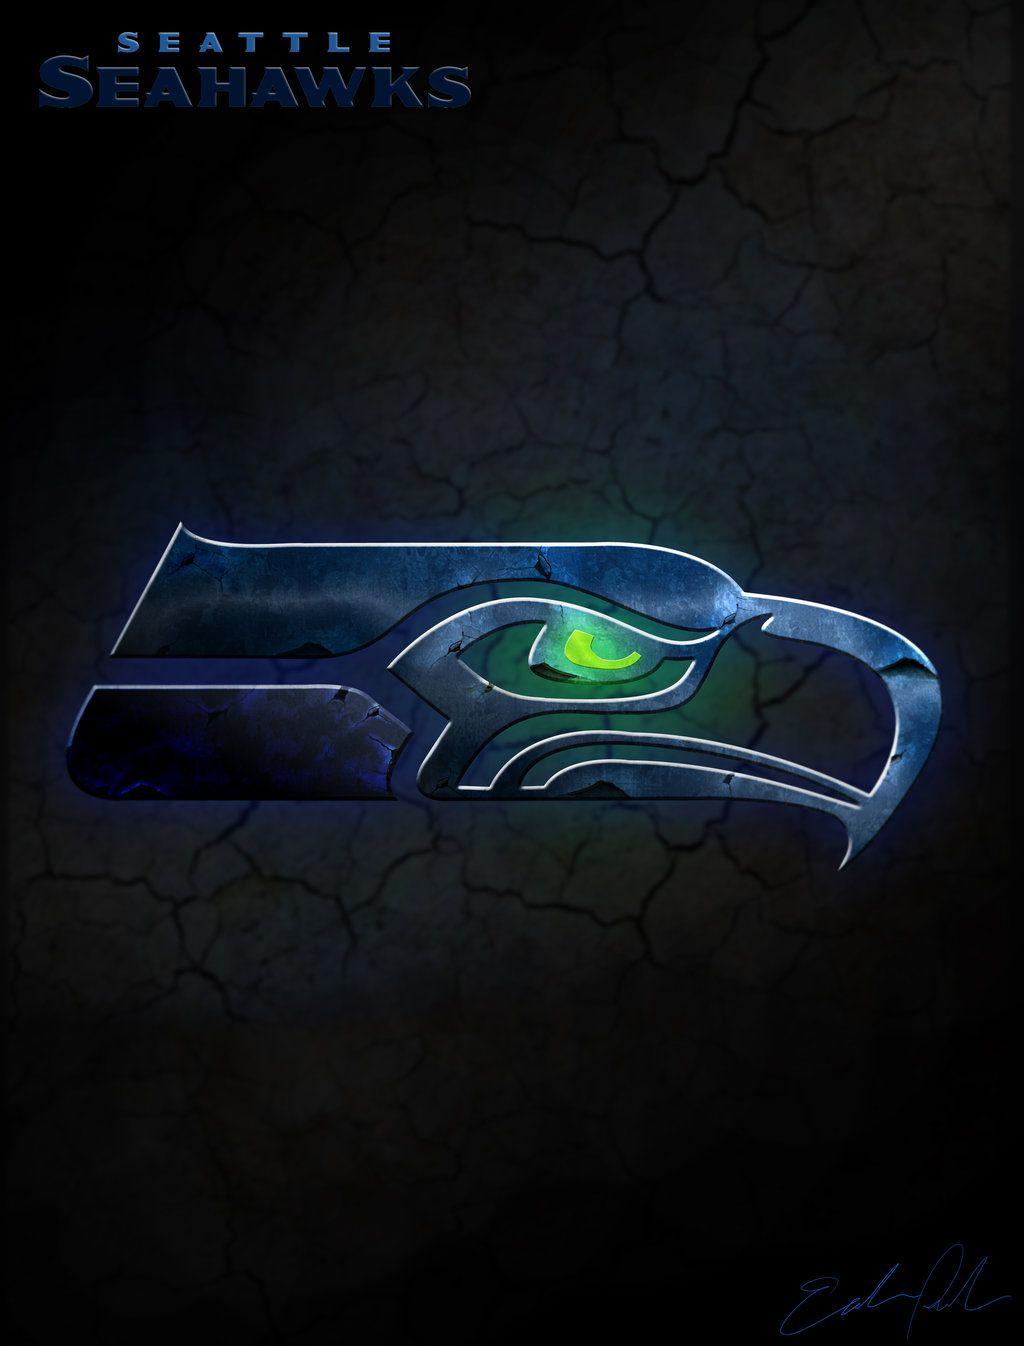 Seattle Seahawks HD Wallpaper Widescreen Wallpapers For